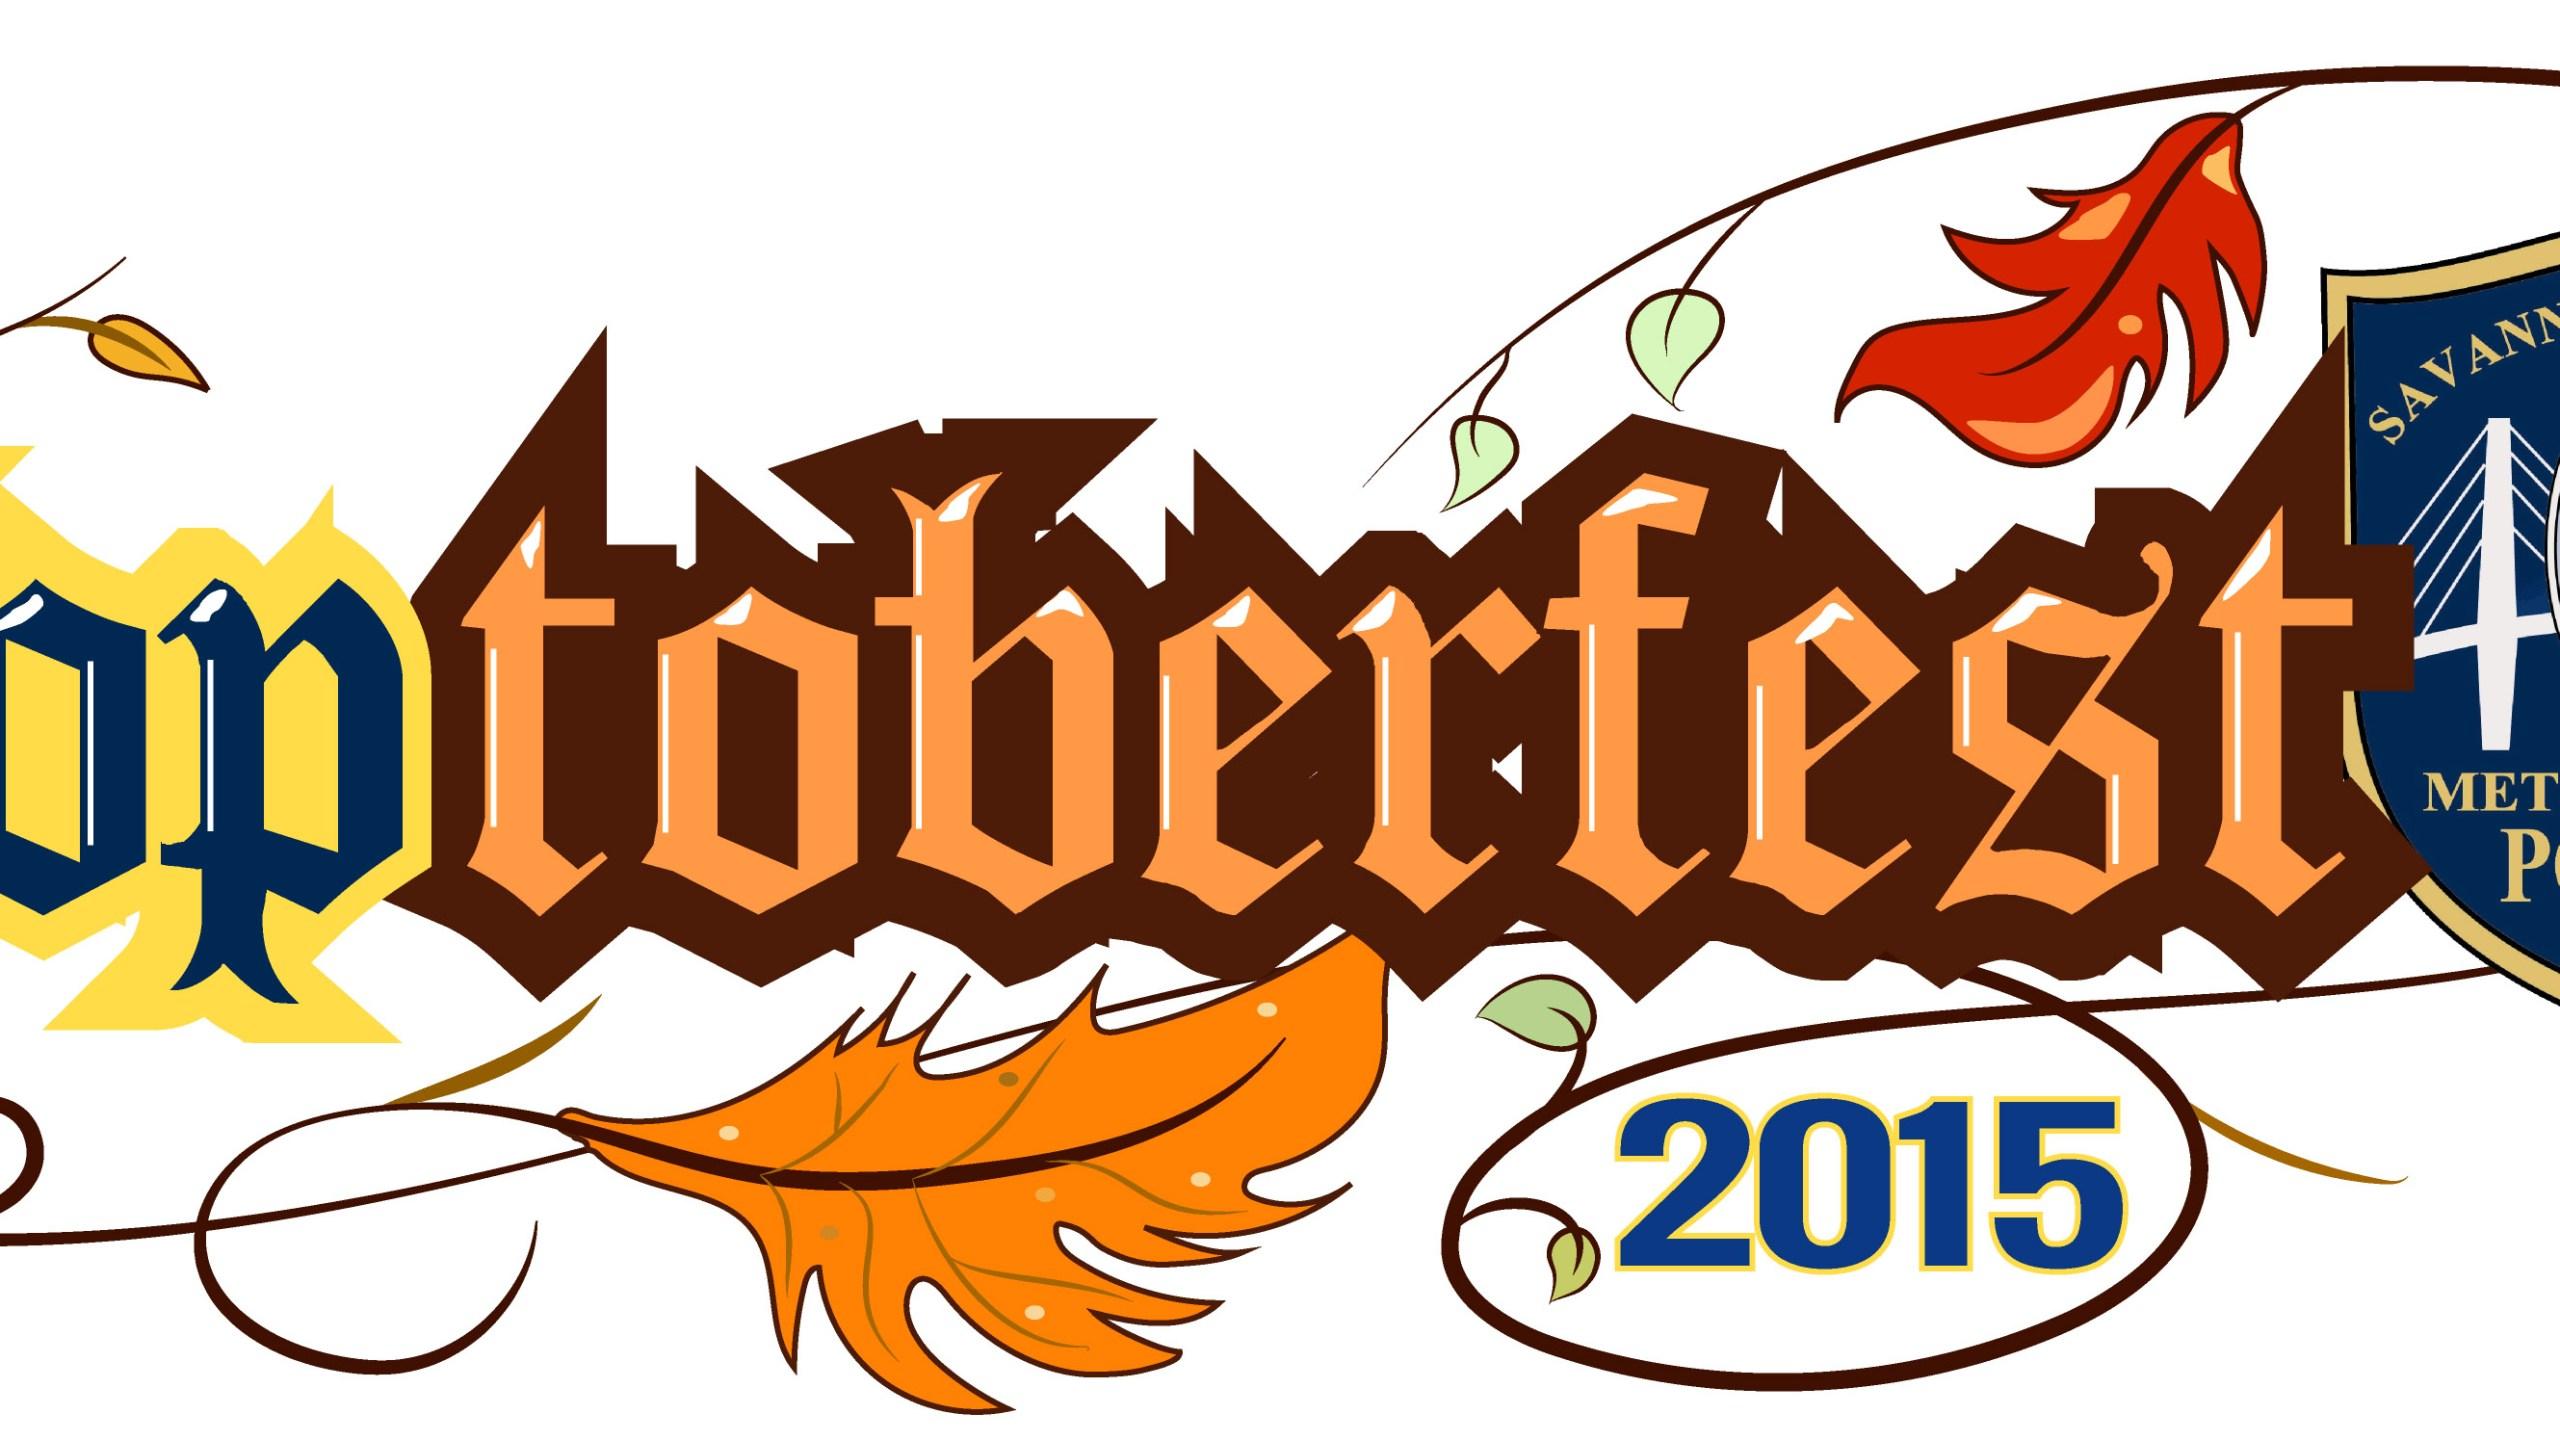 Coptoberfest logo_47972